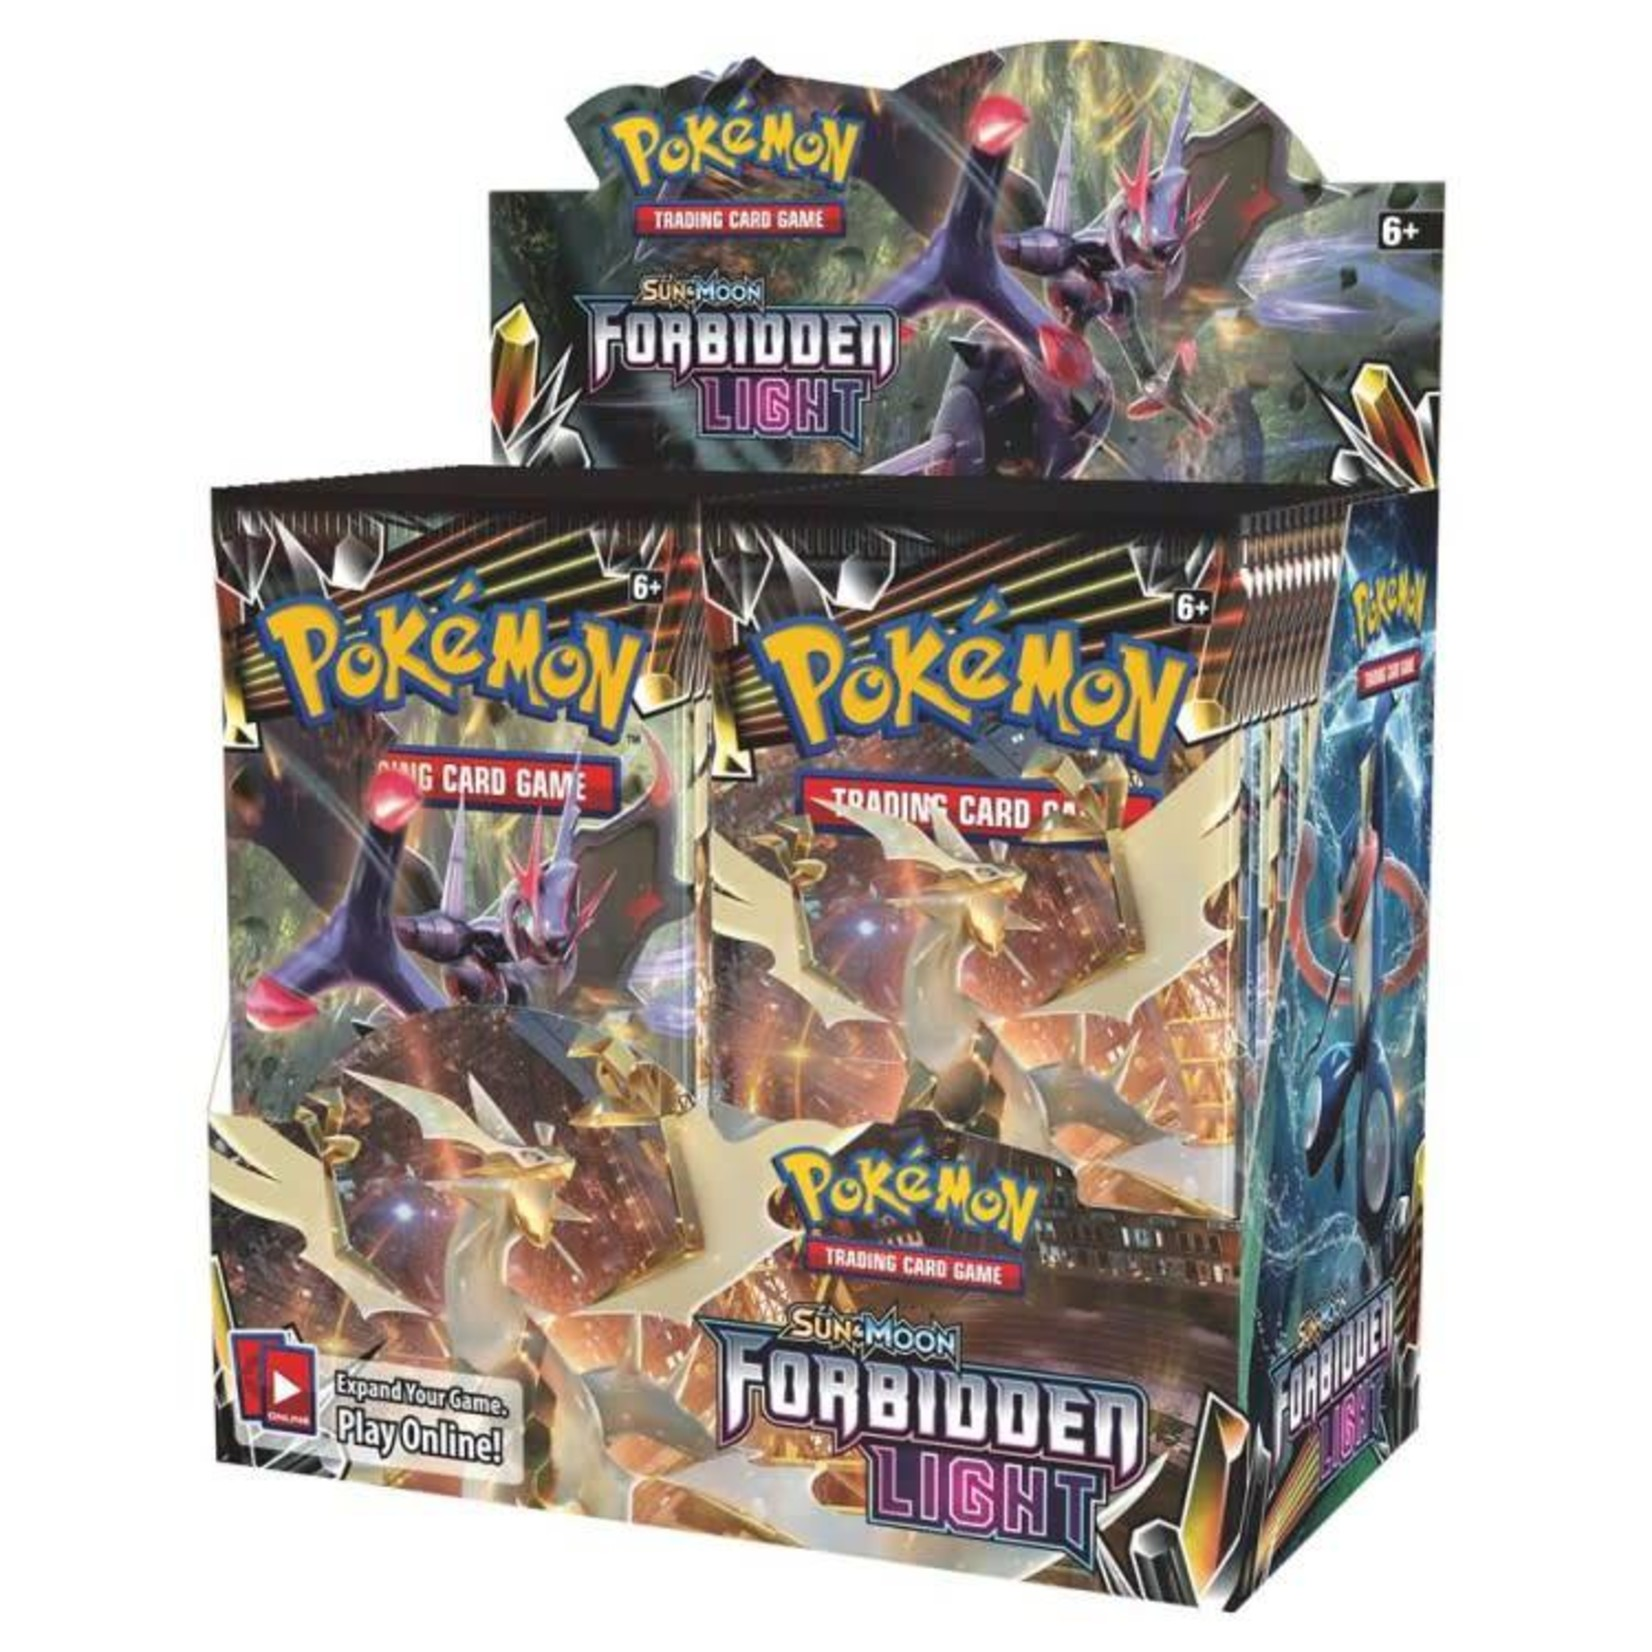 Pokemon International Pokemon Trading Card Game: Forbidden Light Booster Box